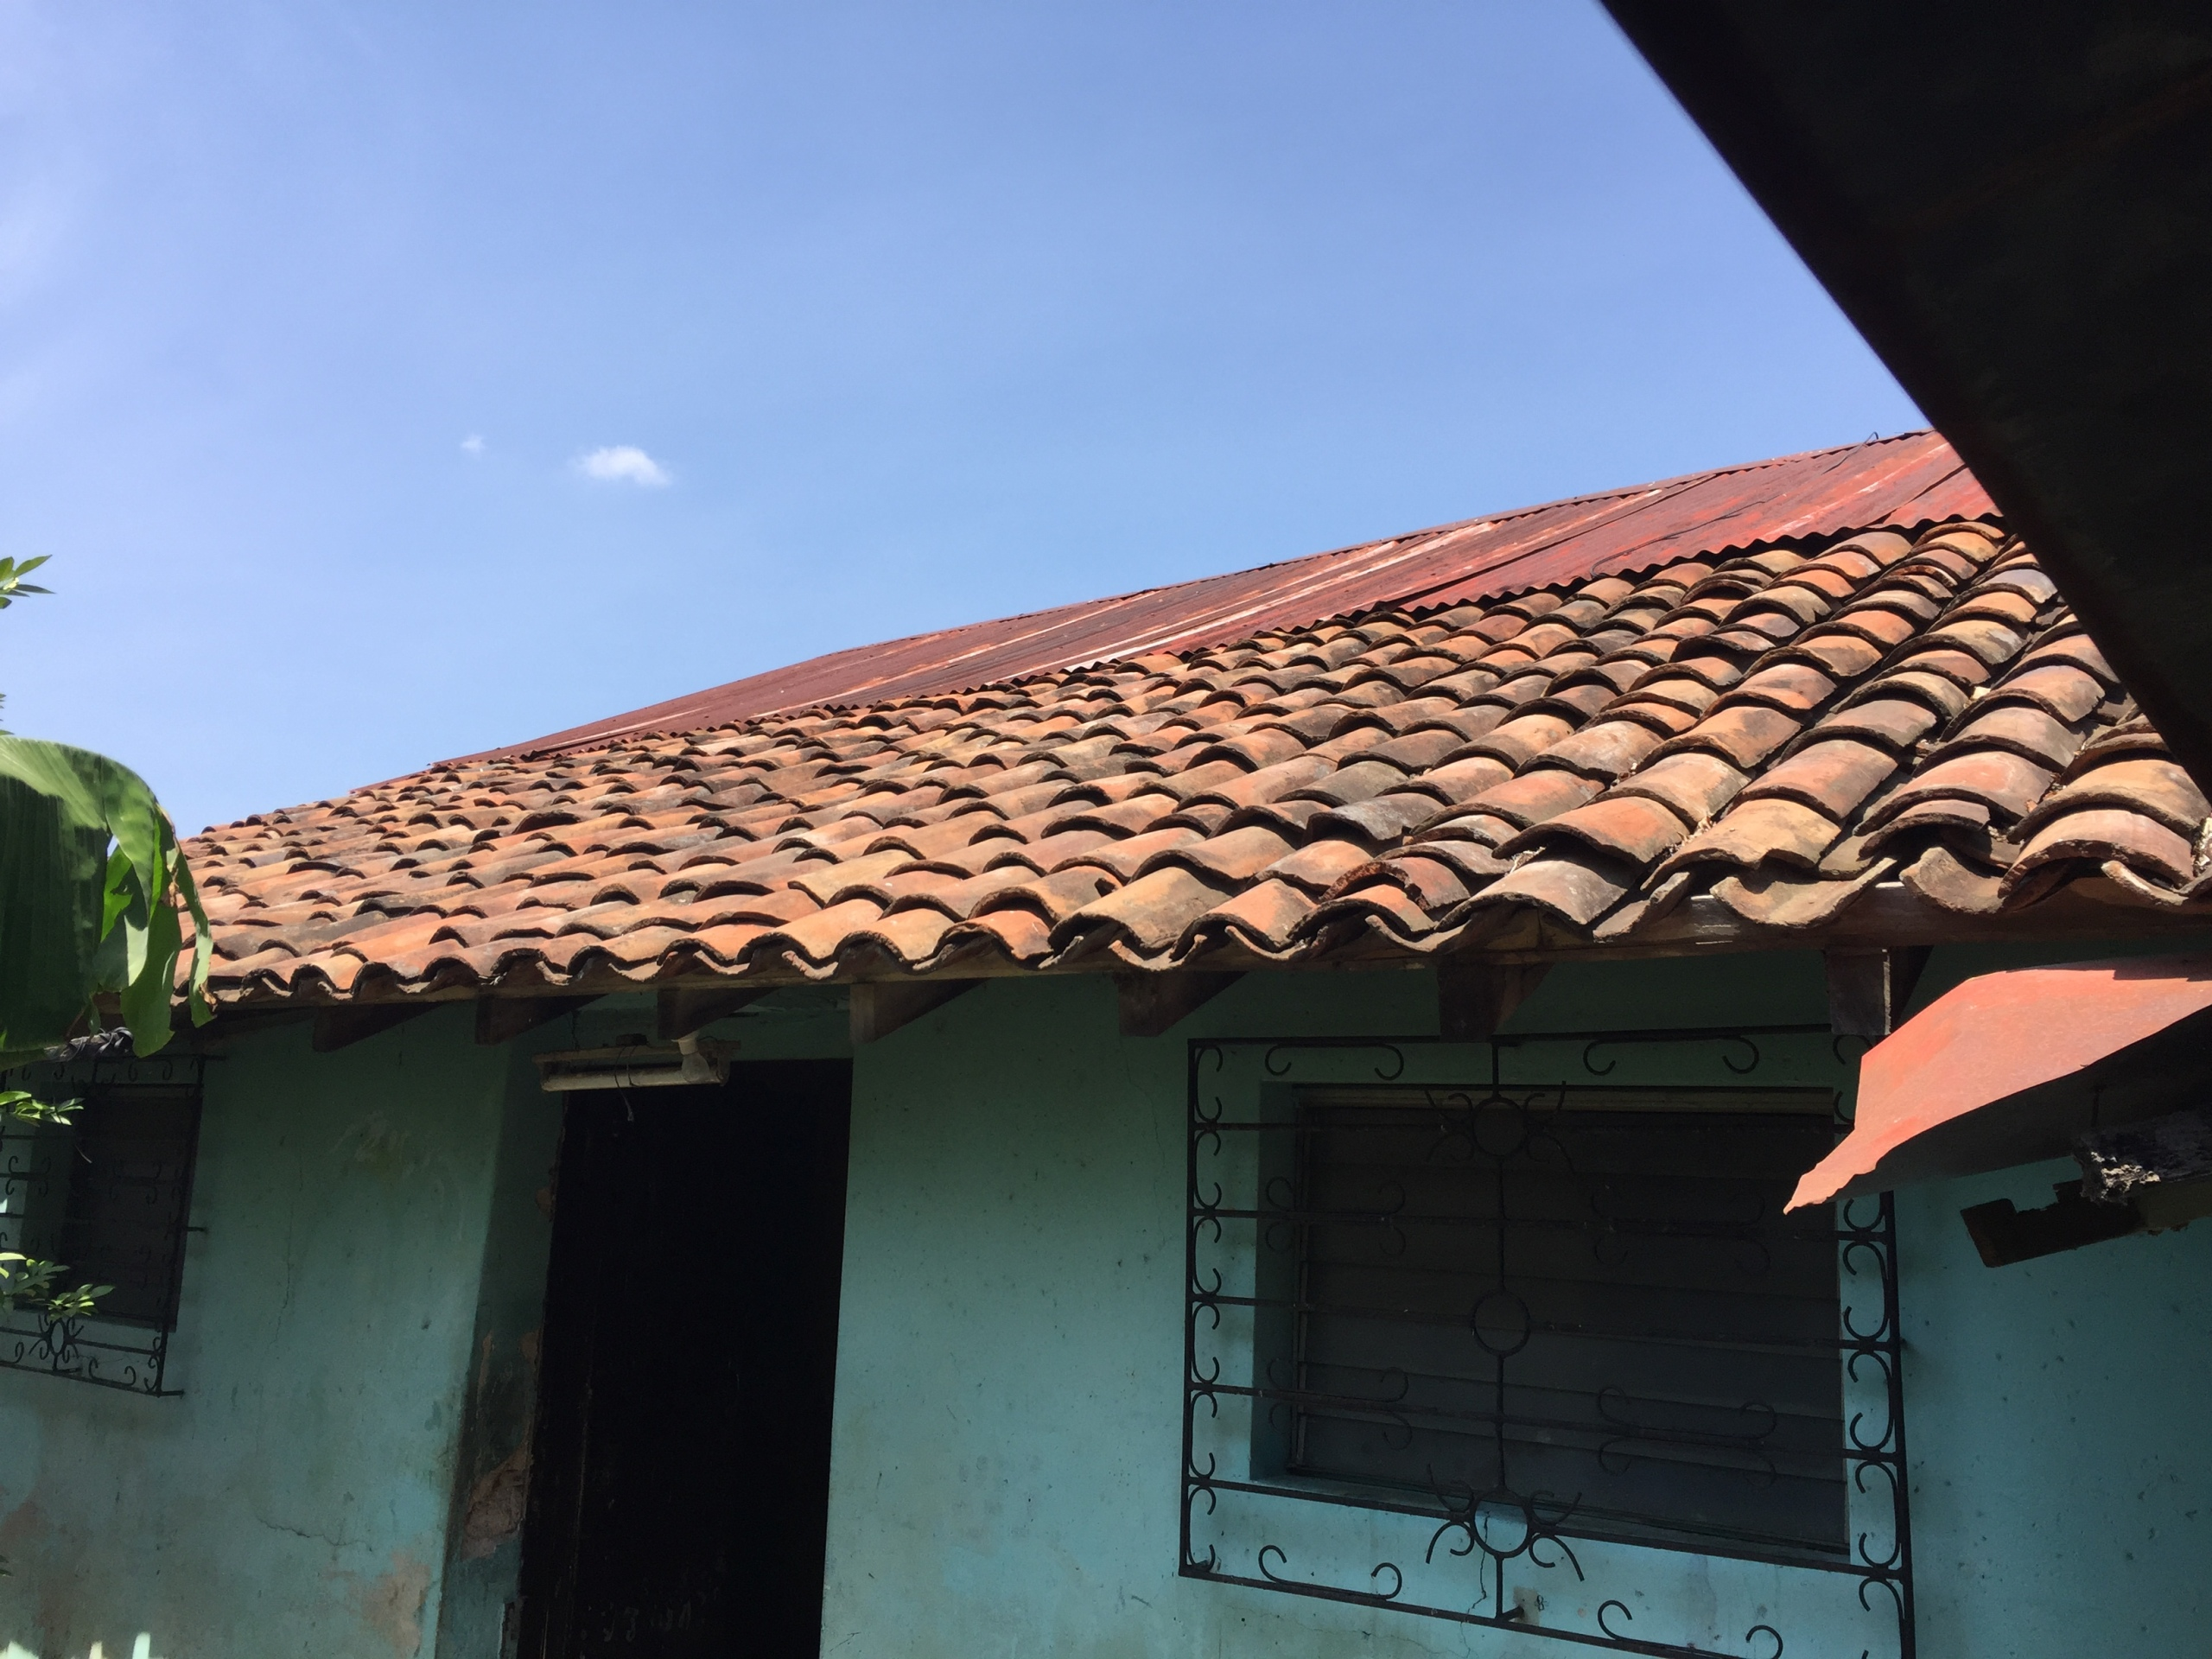 real estate, buying, home, house, Leon, Nicaragua, roof, shingles,